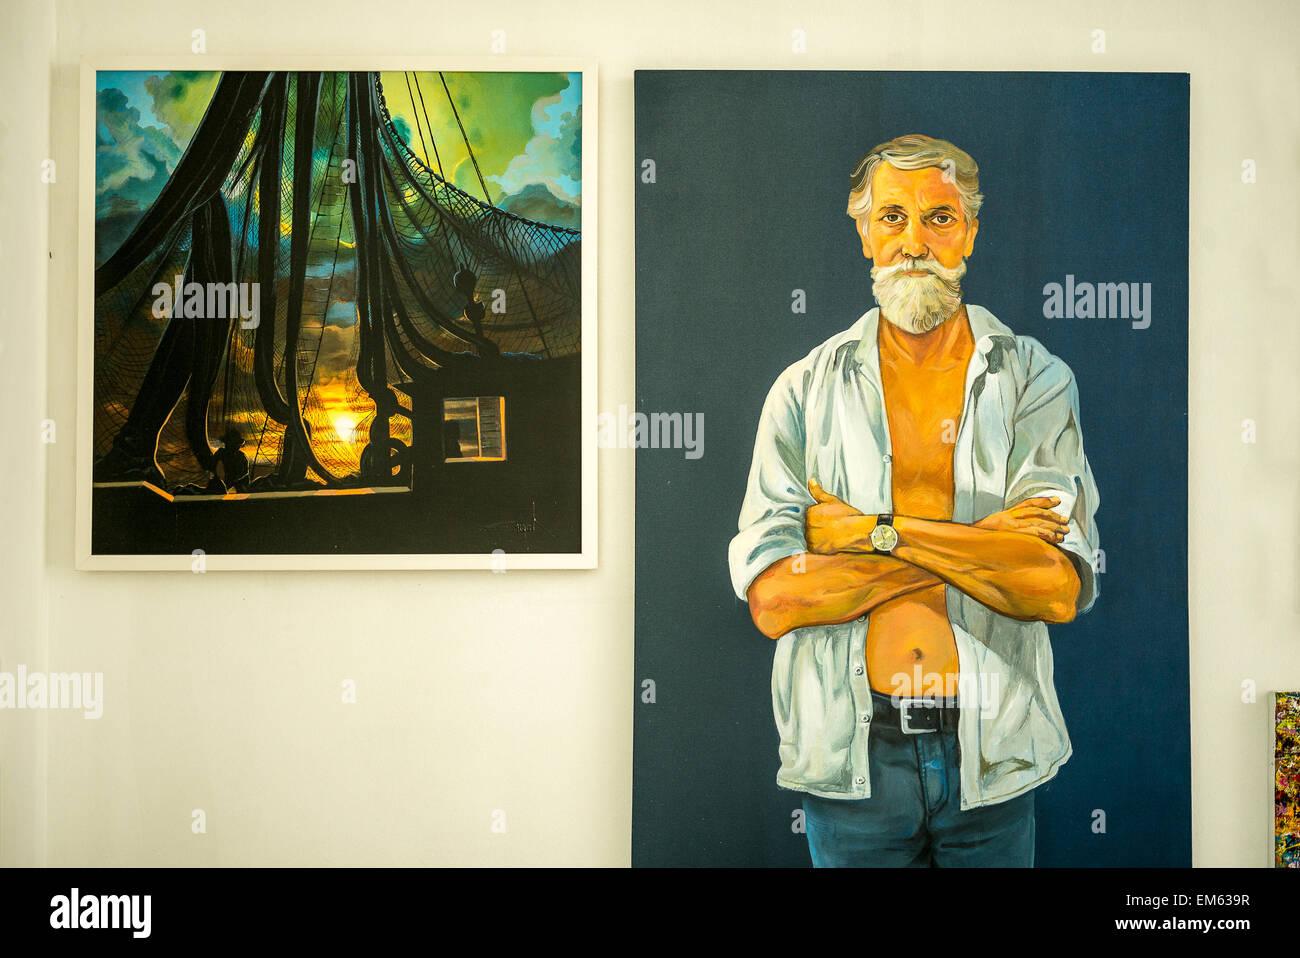 Brazil, Salvador, Pelourinho district, self-portrait in the studio of the painter Justino Marinho - Stock Image